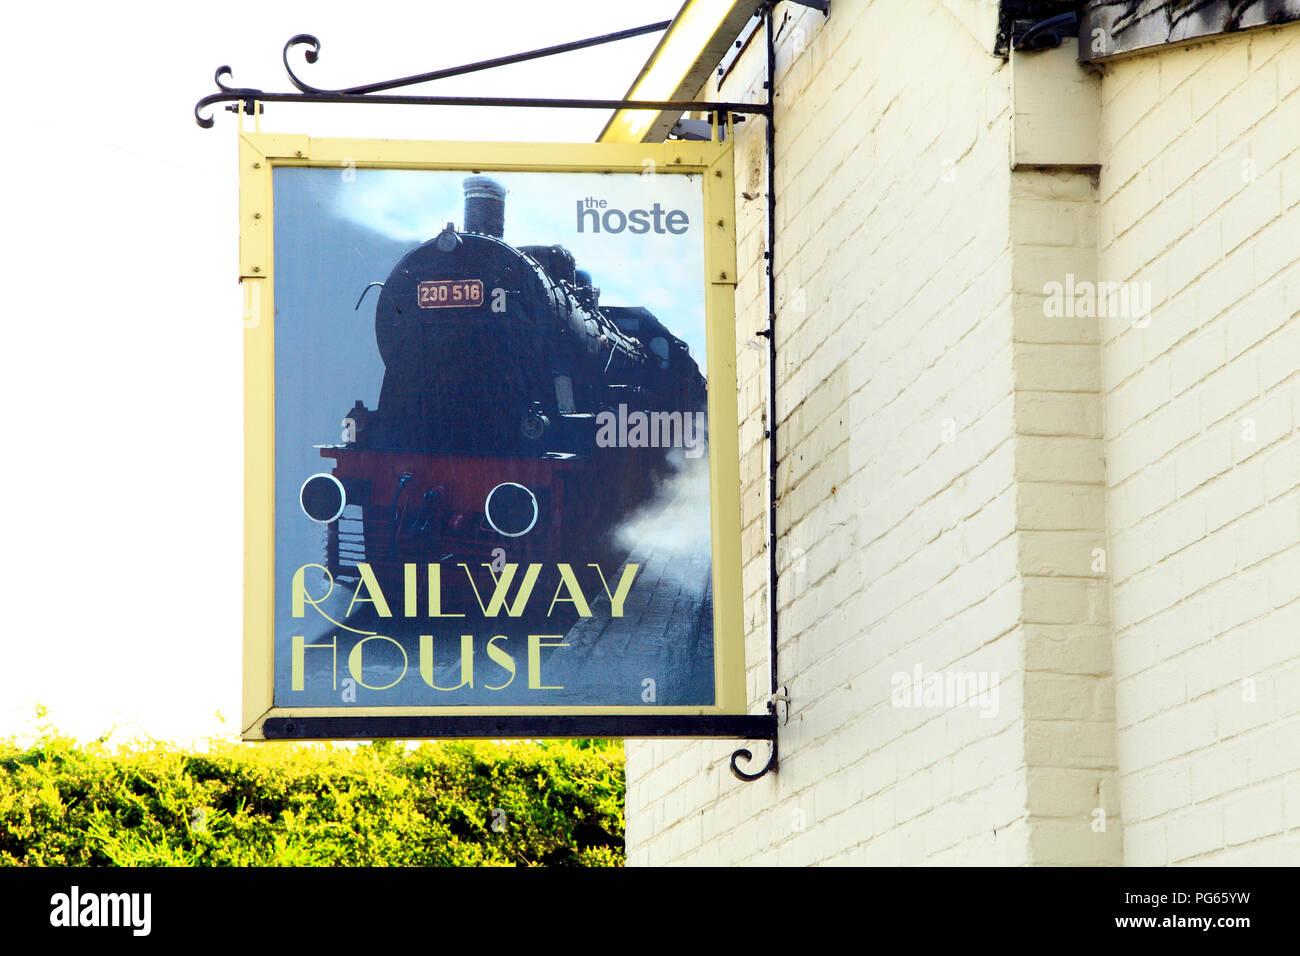 Railway House, hotel, Hoste Arms, Sign Board, Burnham Market, Norfolk, UK - Stock Image